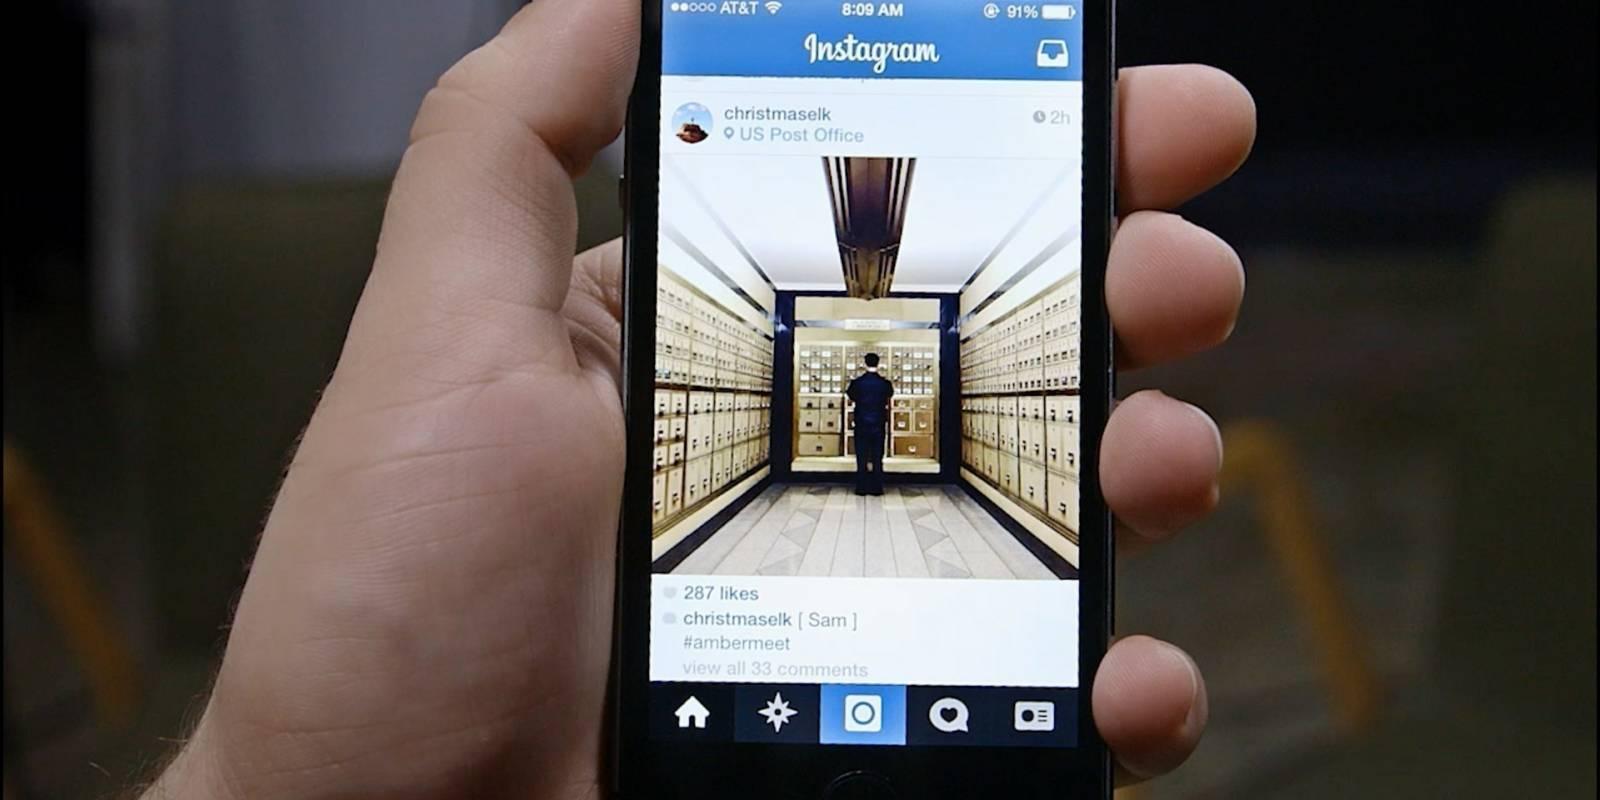 instagramiphoneapp1920-32e8a8235abf19d62e7bc4a6c4f0b74e.jpg